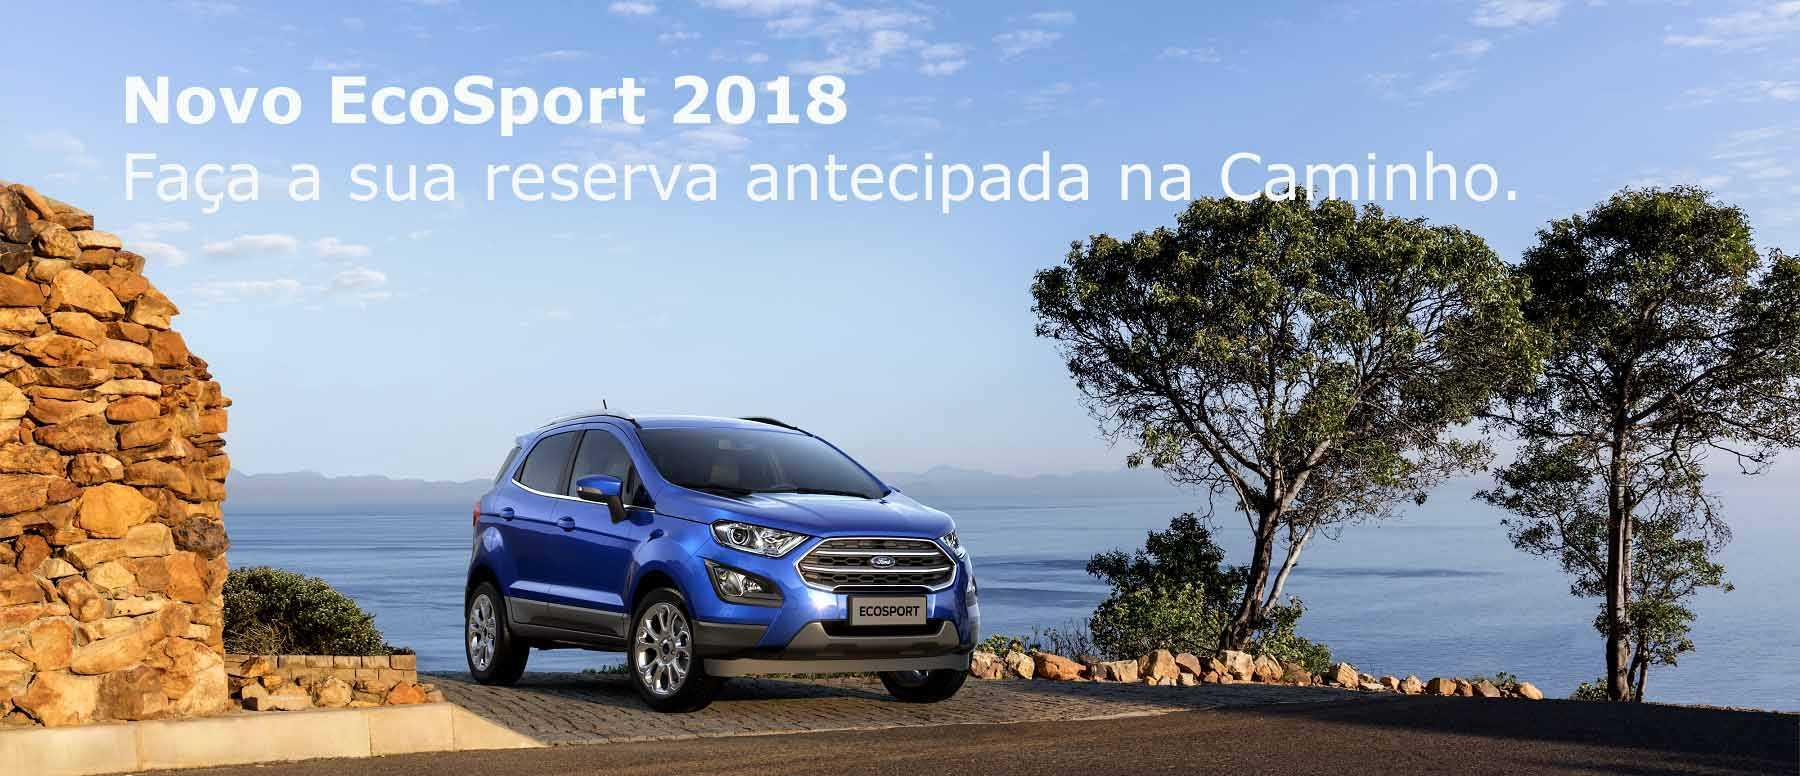 Nova Ecosport 2018